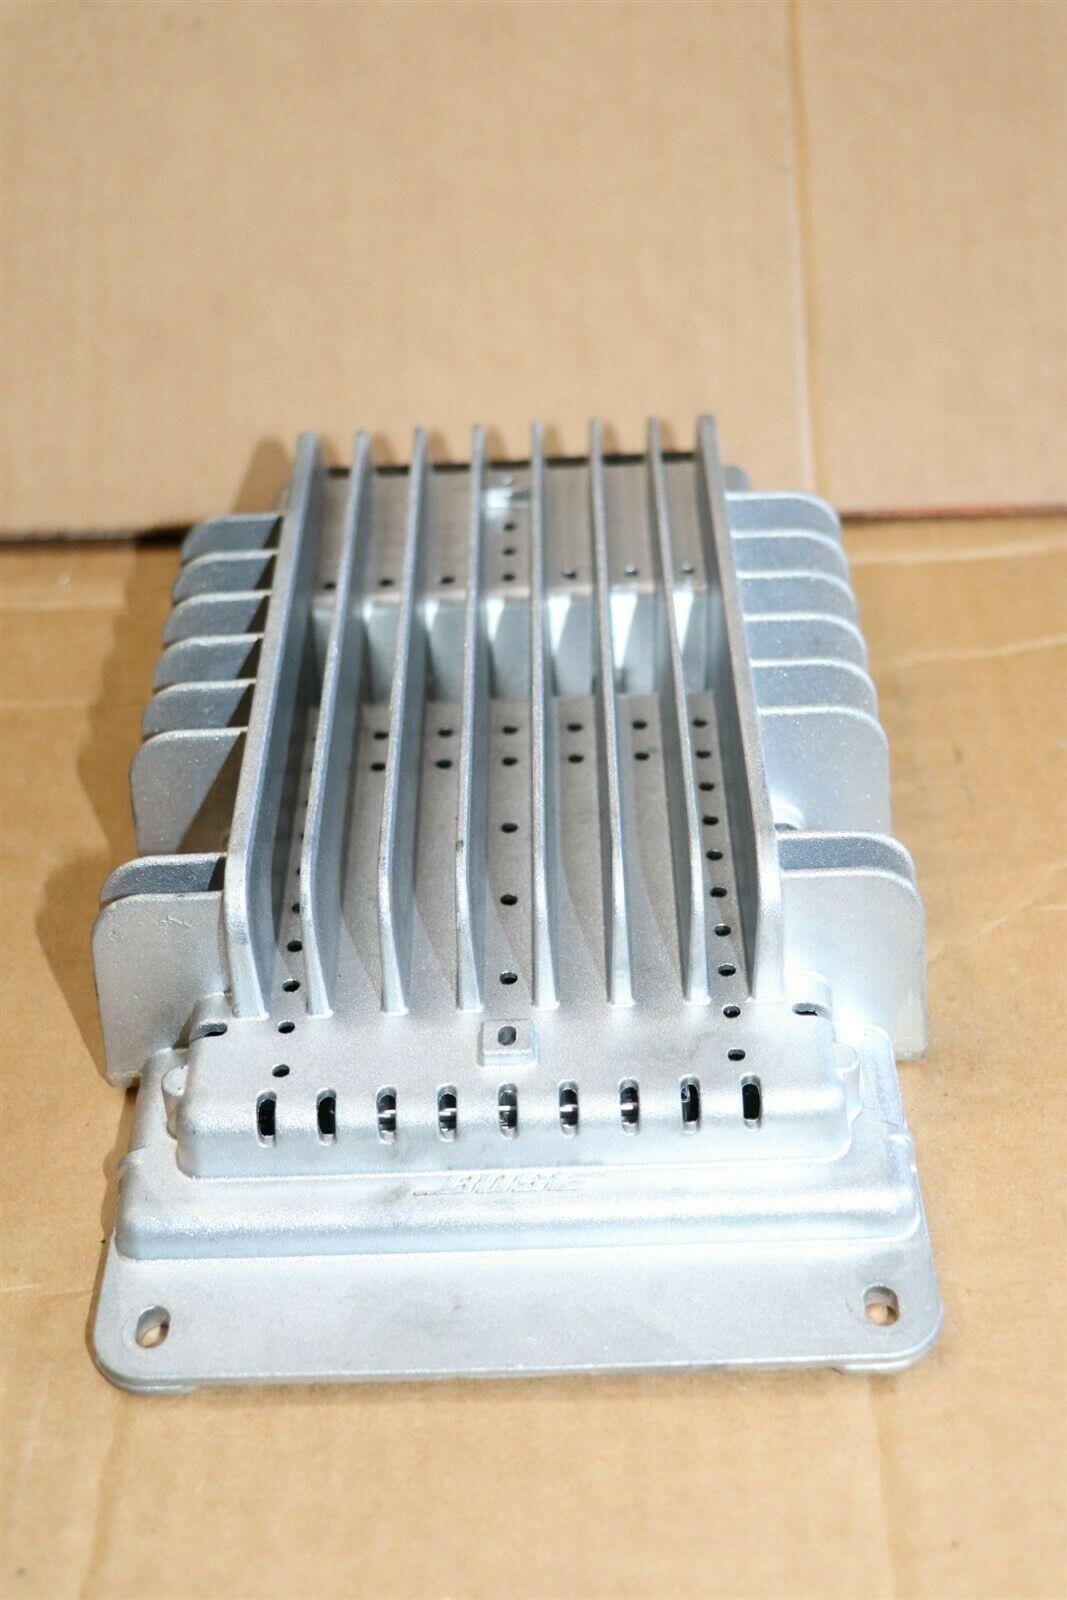 Audi A4 B6 Cabrio BOSE Amplifier Amp Stereo Receiver Audio 281179-002